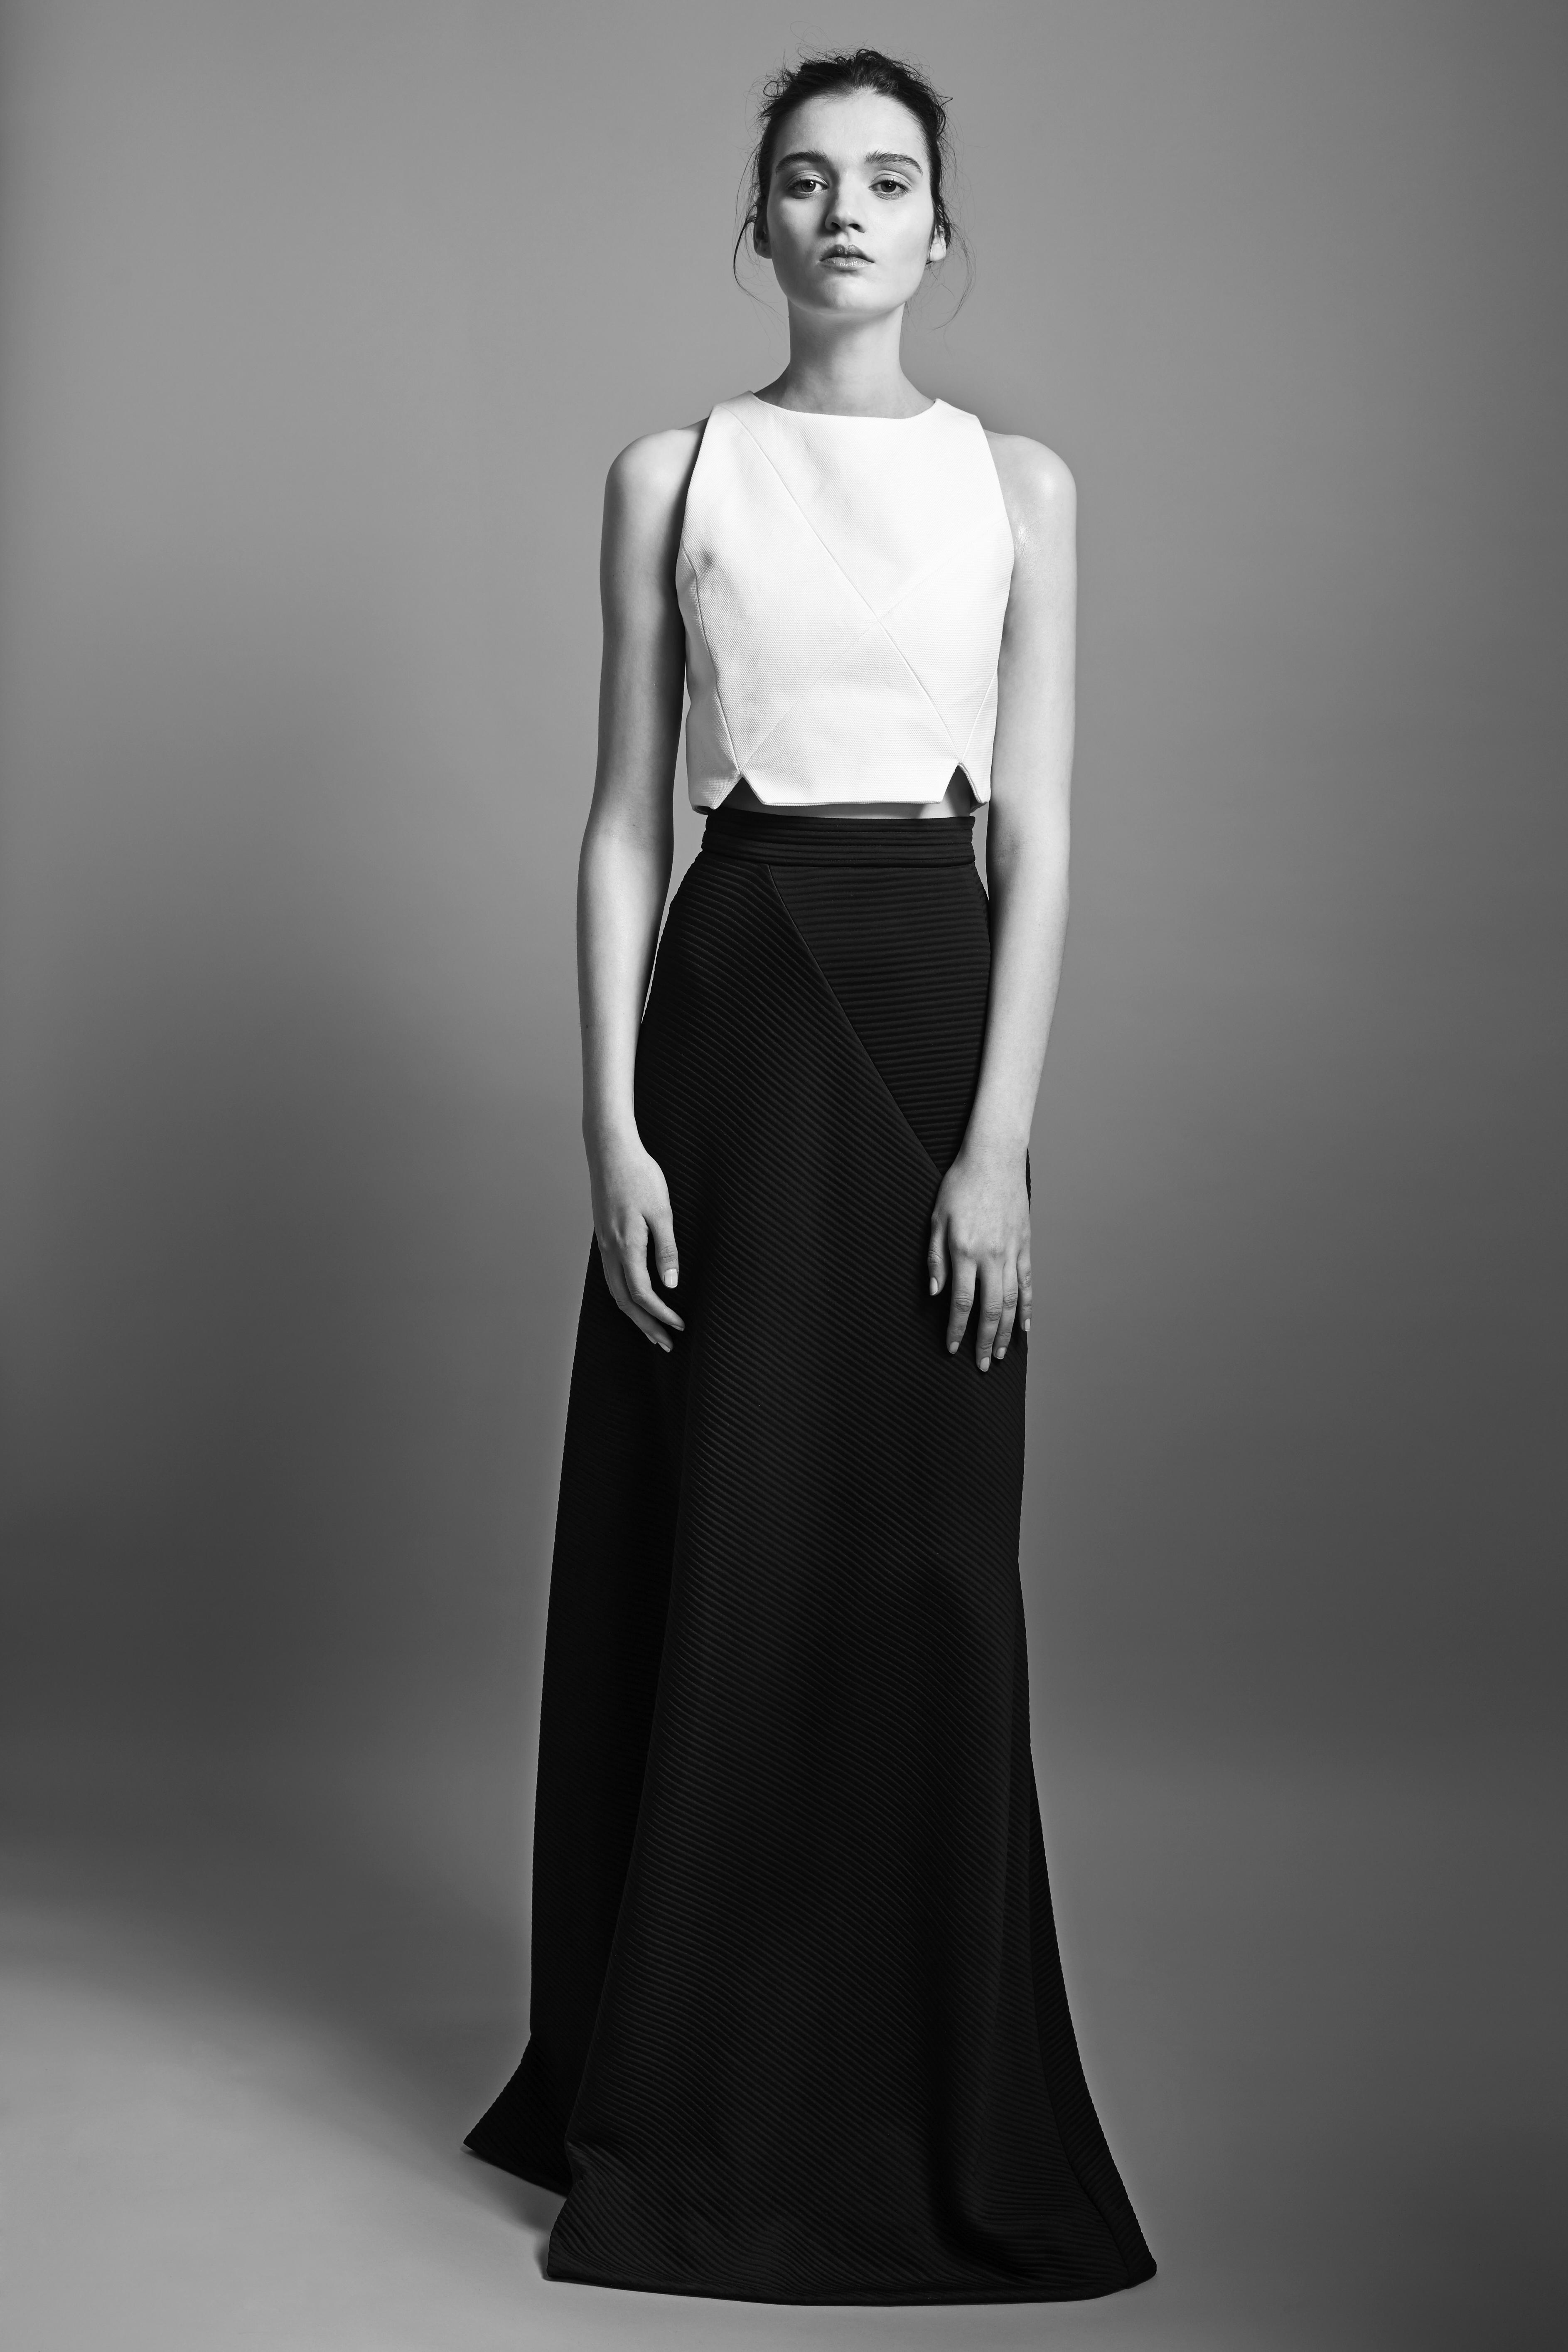 kilenzss15_dresses_shot-1_257